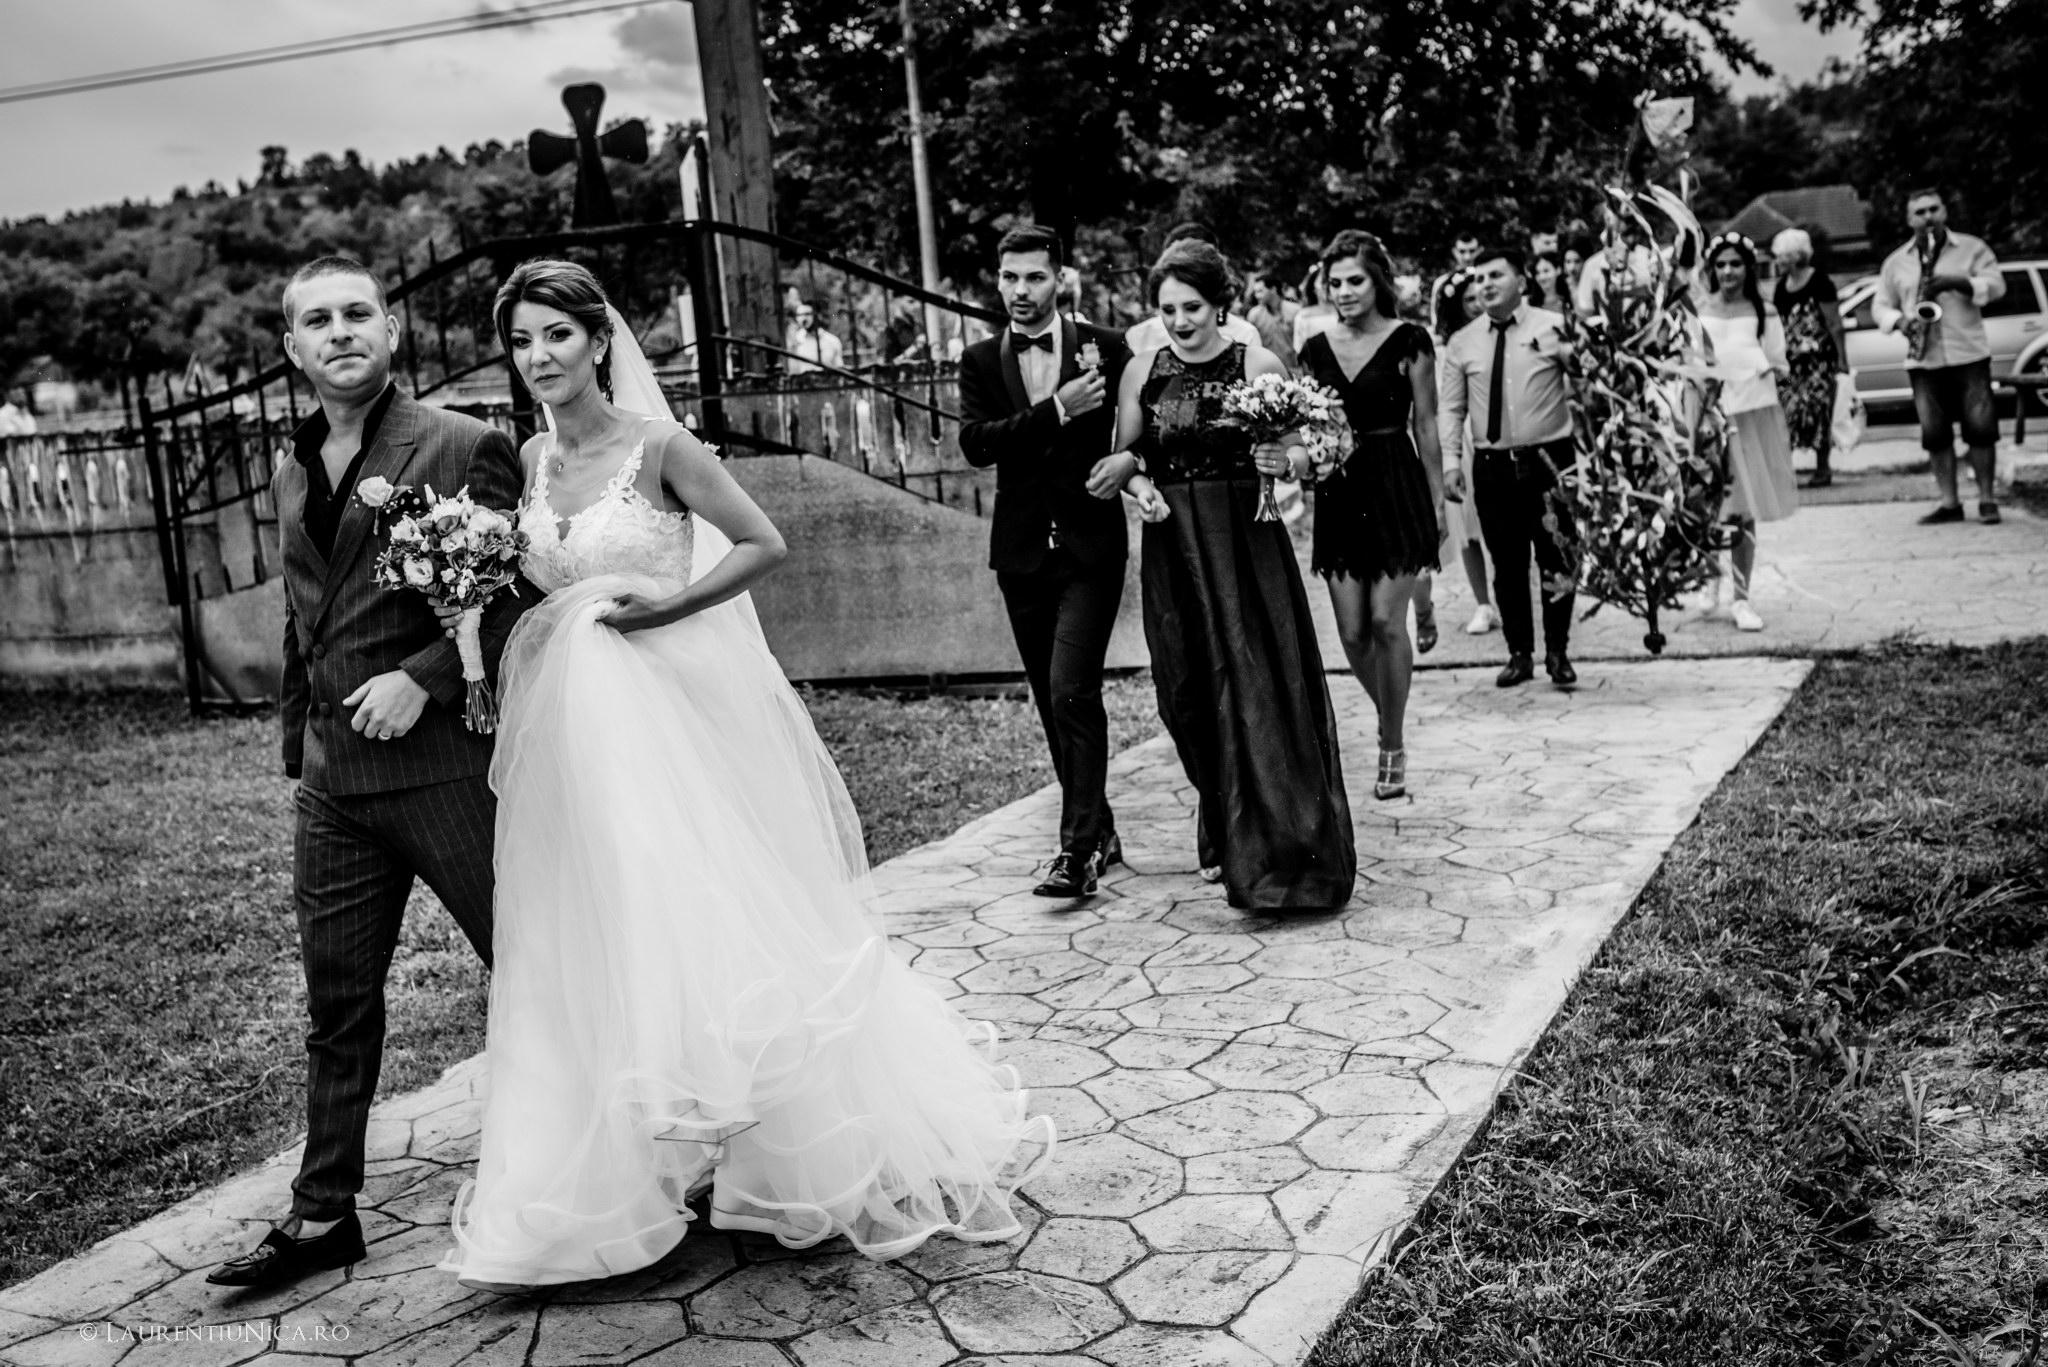 madalina madalin fotograf nunta laurentiu nica turceni gorj 15 - Madalina & Madalin | Fotografii nunta | Judetul Gorj